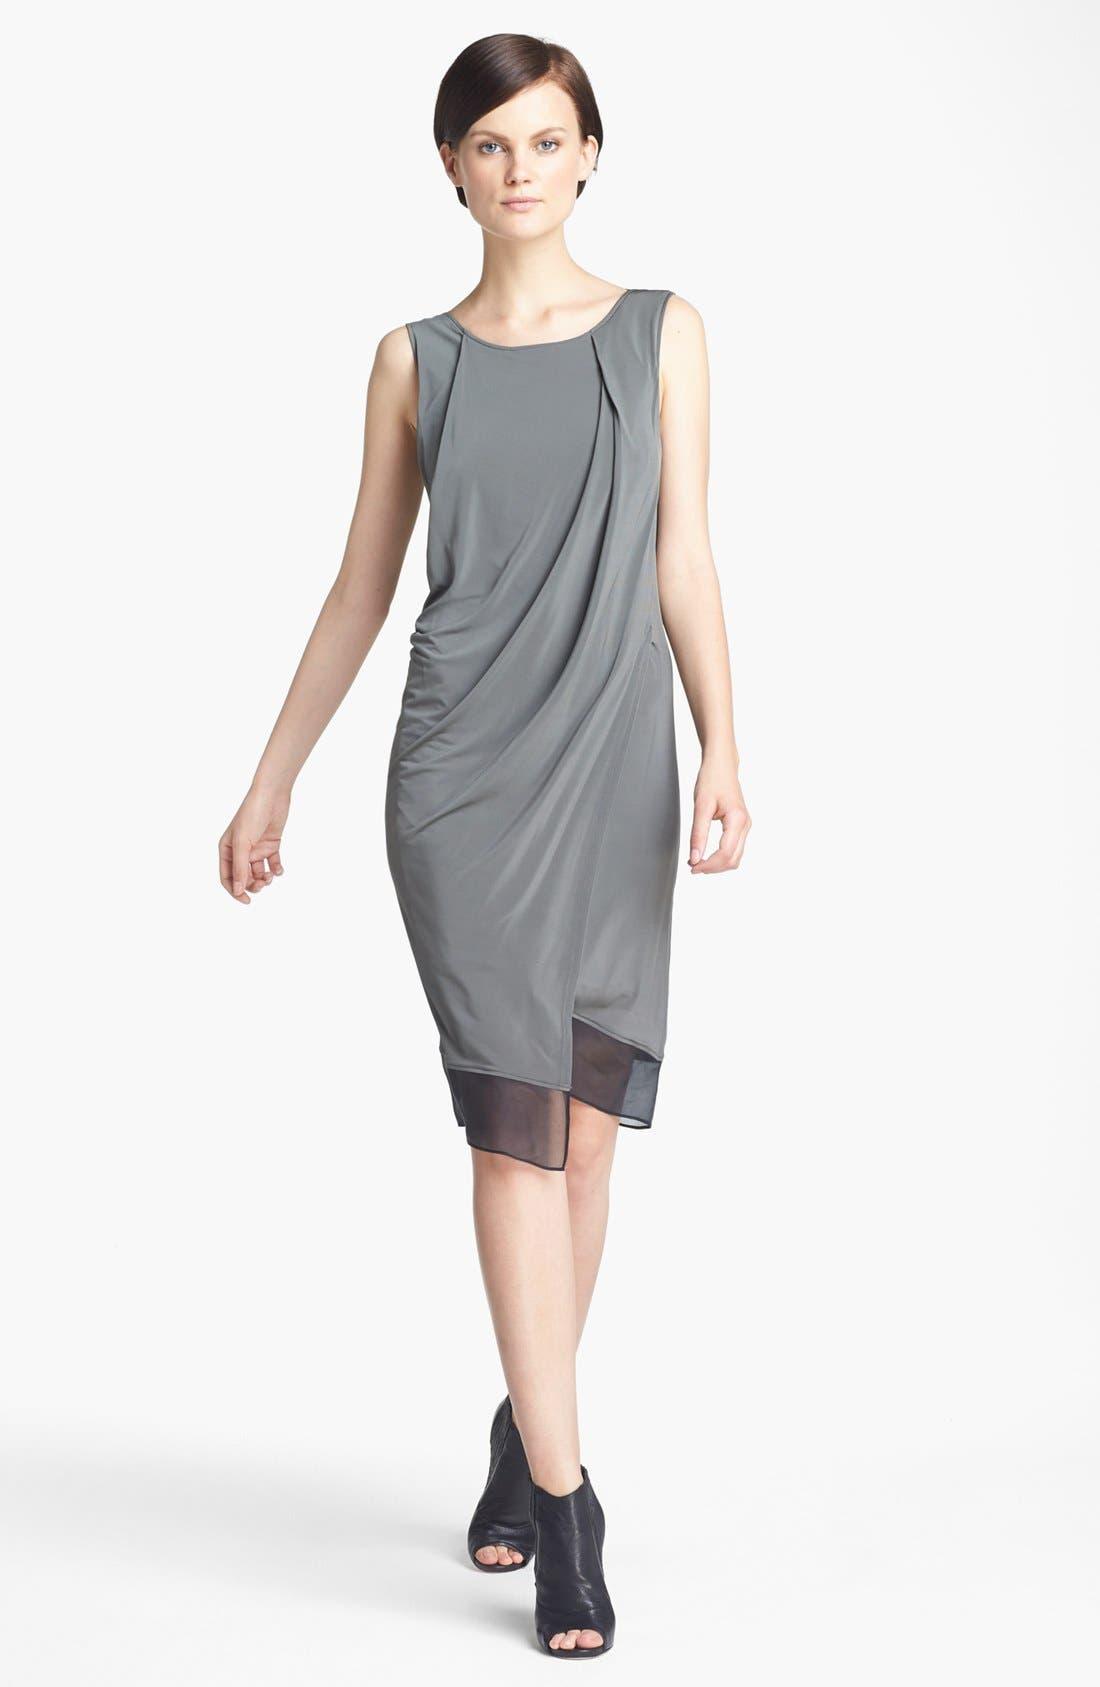 Main Image - Helmut Lang 'Melody' Sleeveless Dress